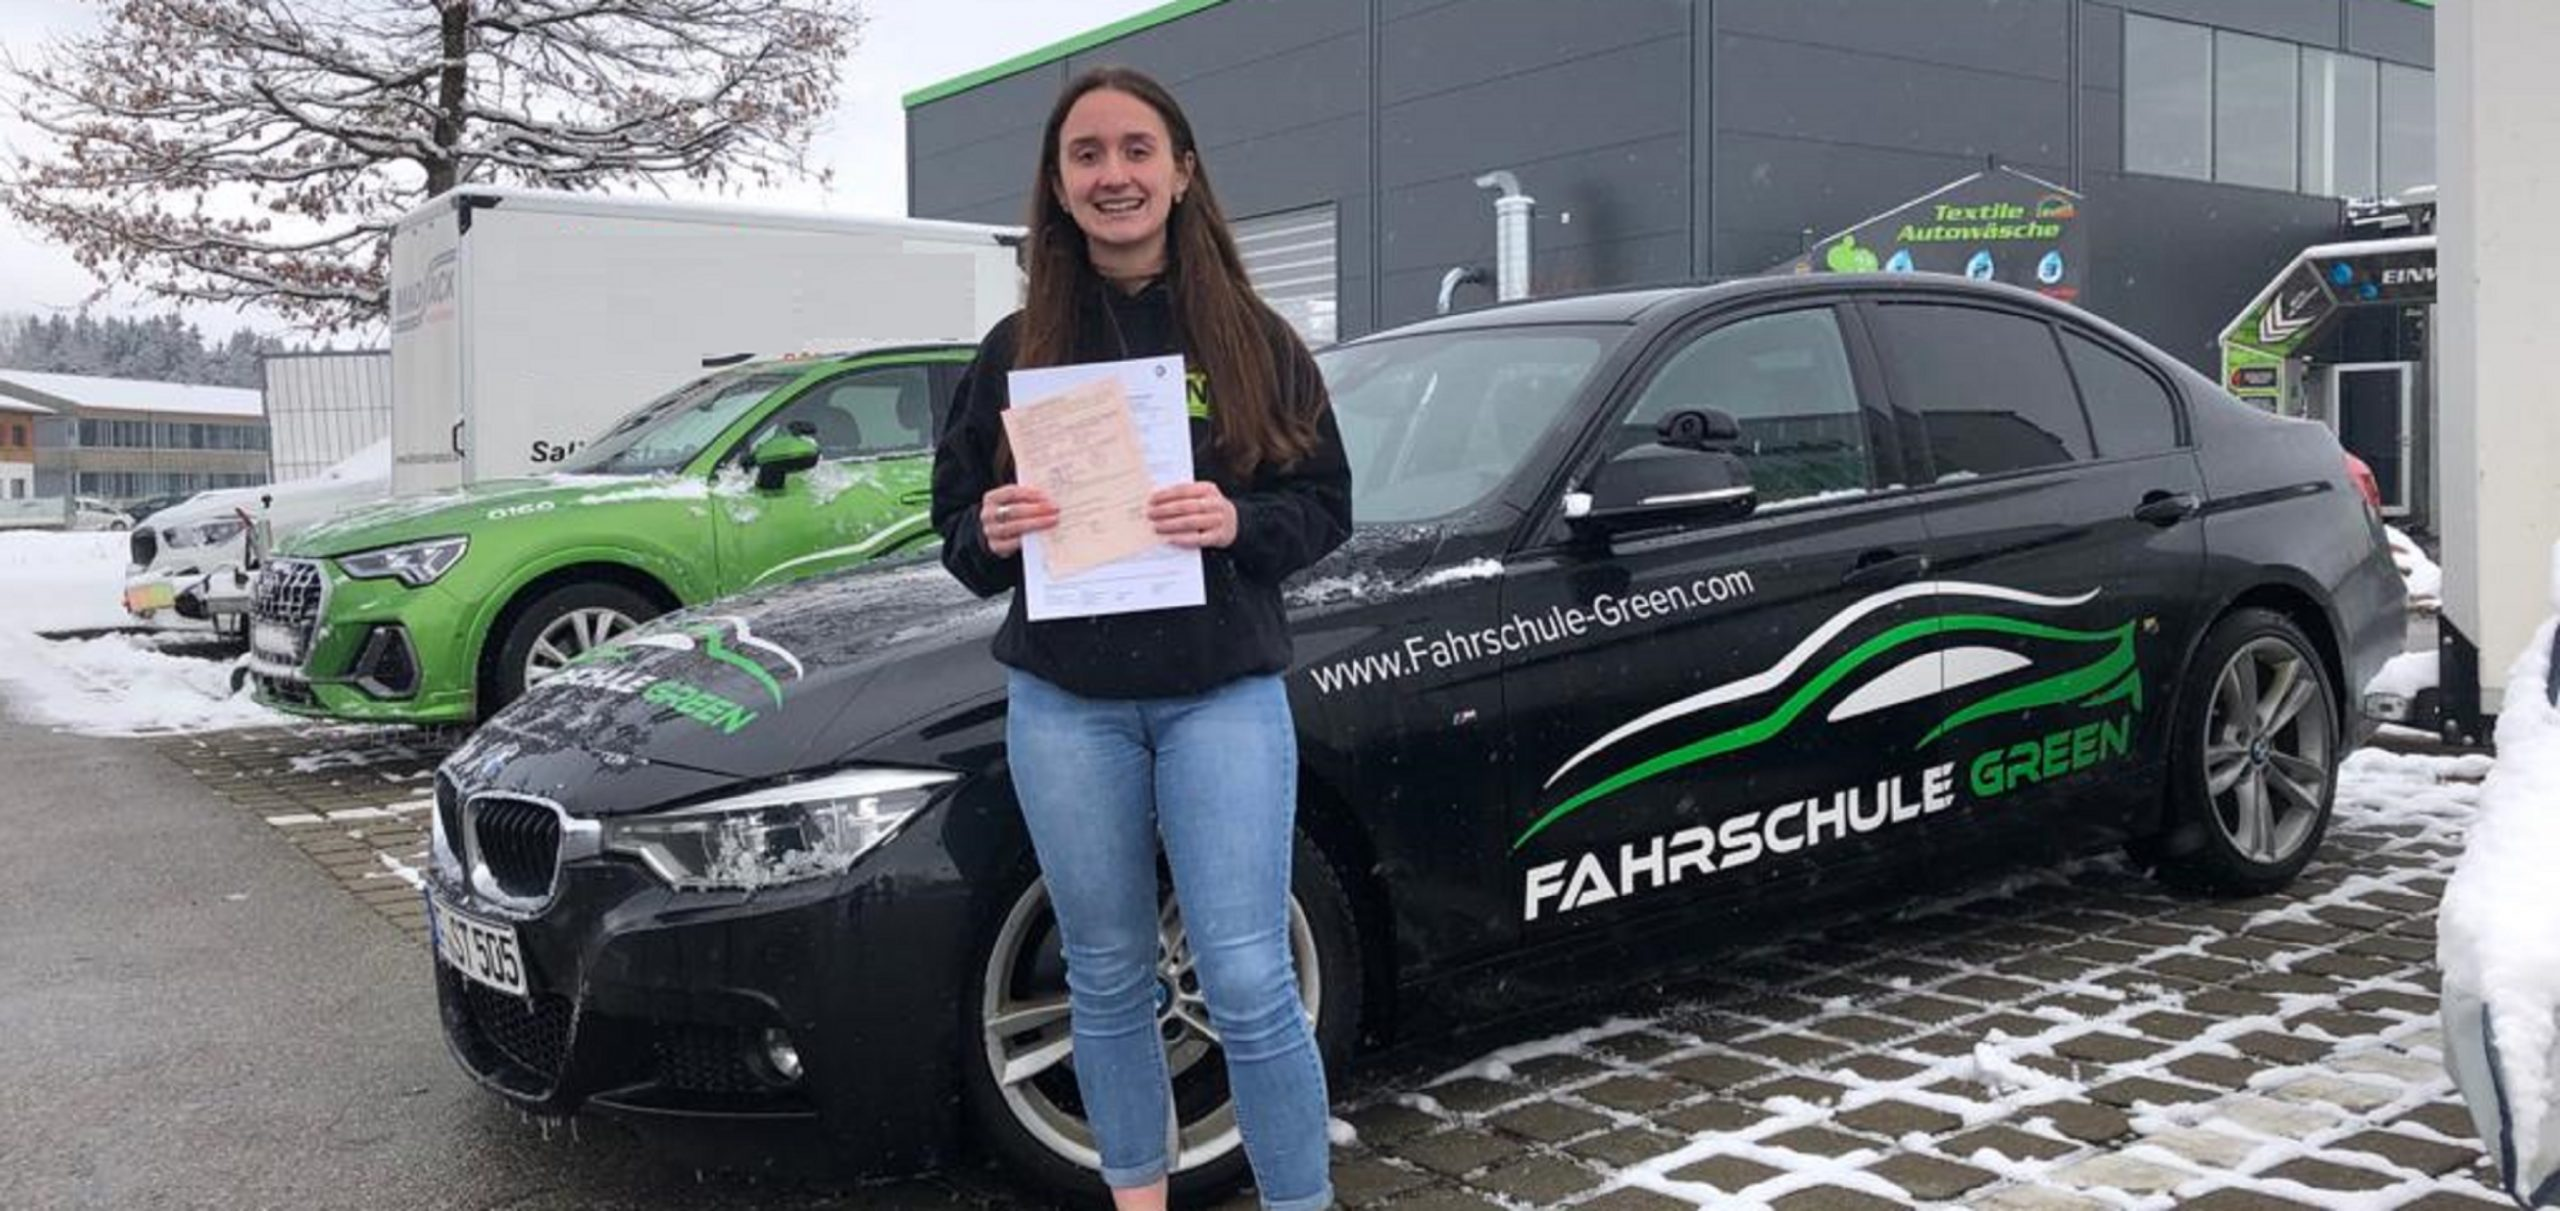 ramona-manuela-moeggenried-pruefungen-2021-fahrschule-green-kaufbeuren-neugablonz